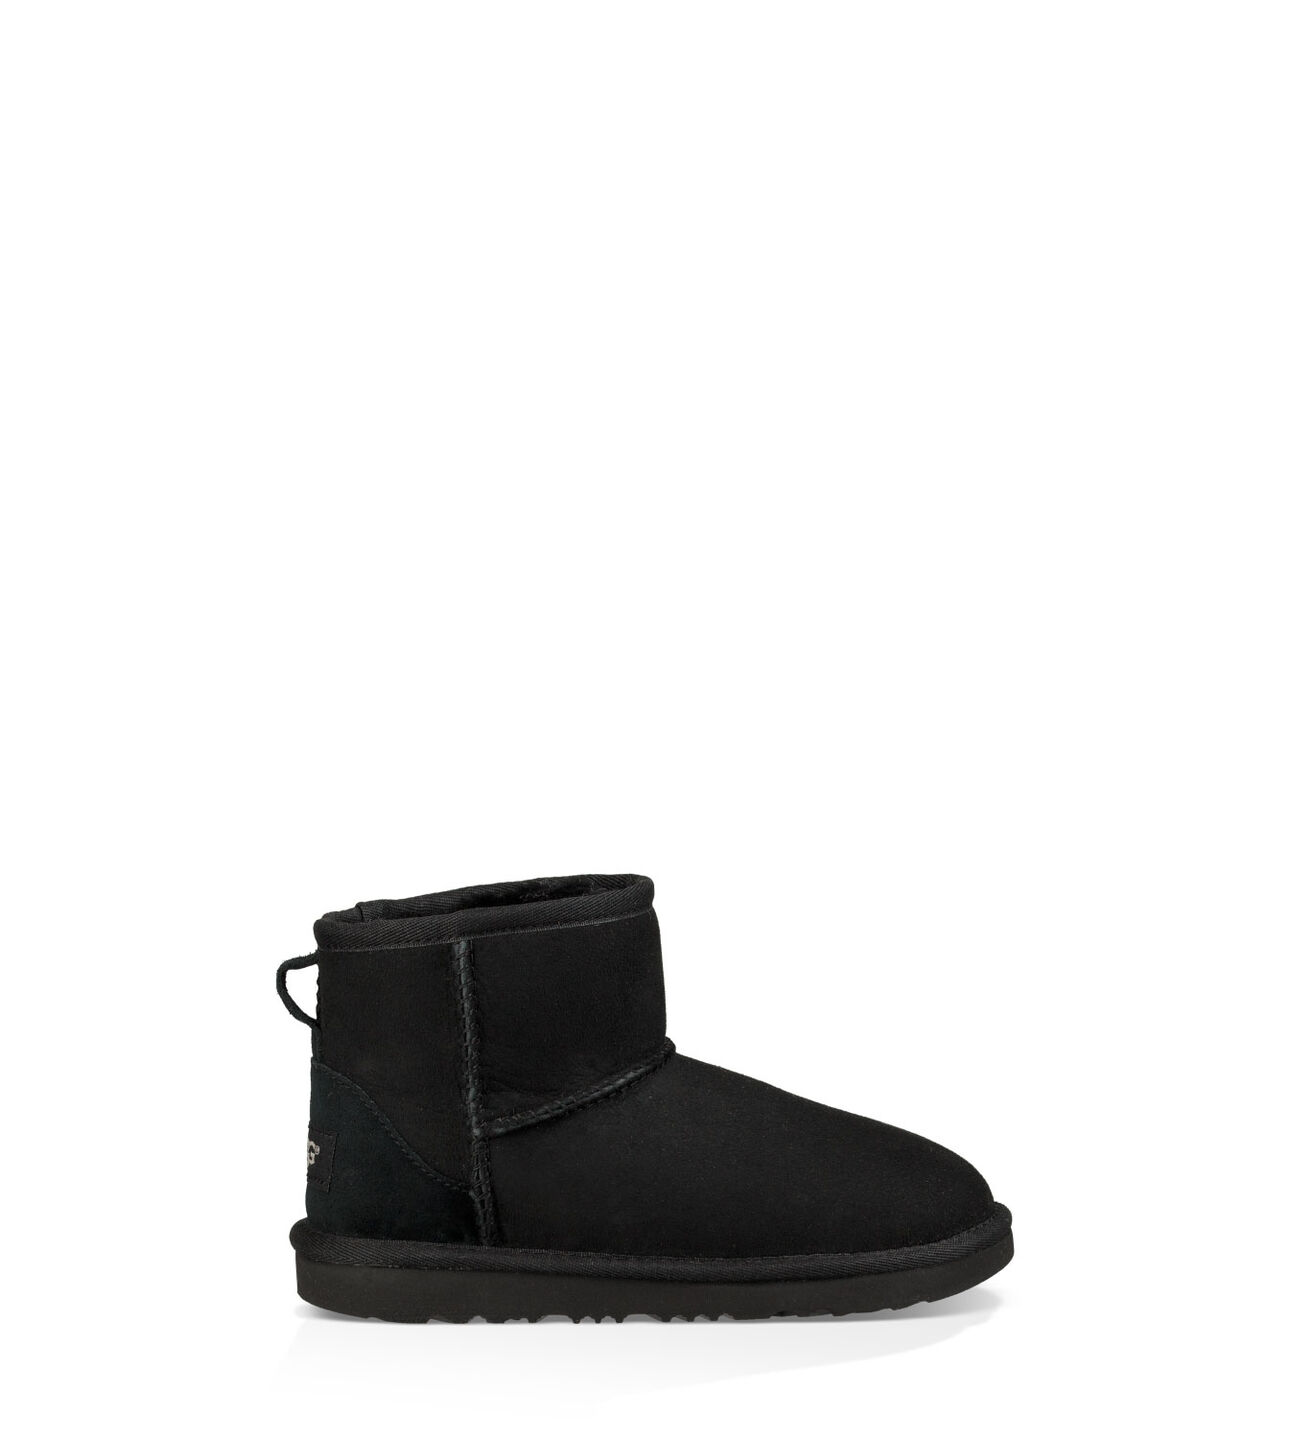 3970e335e5c Boots, Sandals, & Chukkas for Boys | UGG® Official